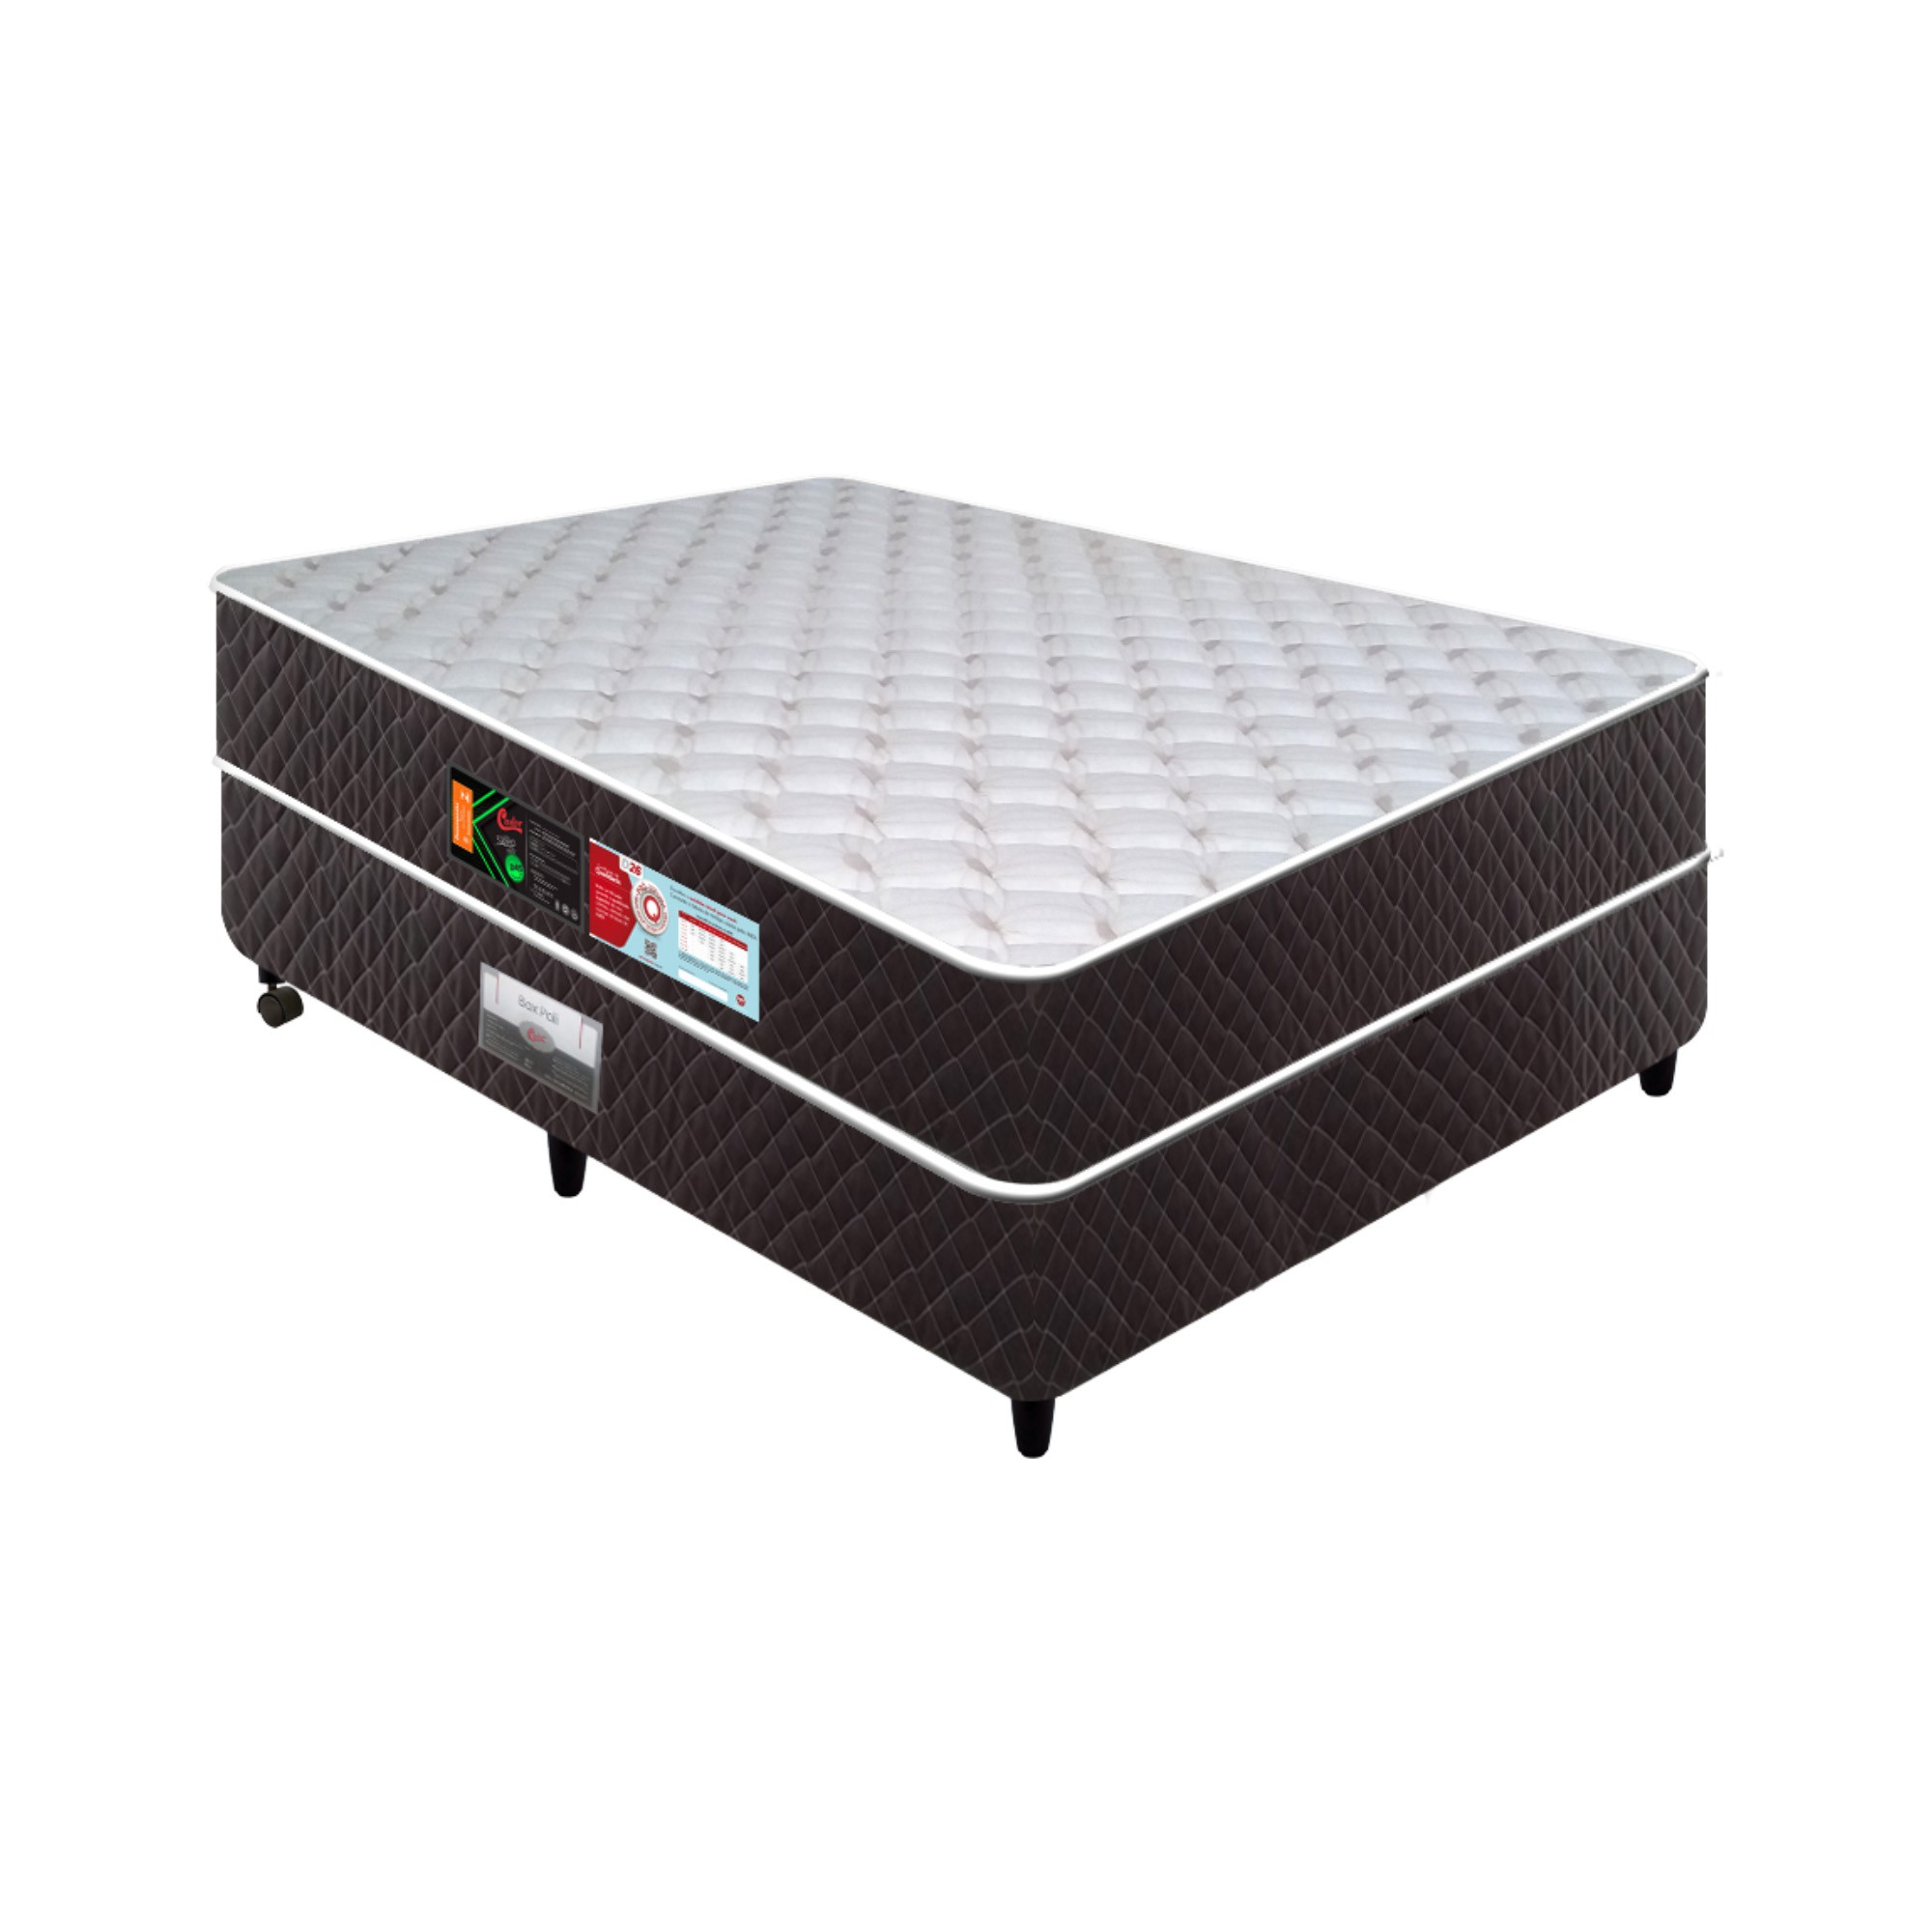 Conjunto Box Castor Sleep Max D28 [Solteiro 088 x 188 cm]